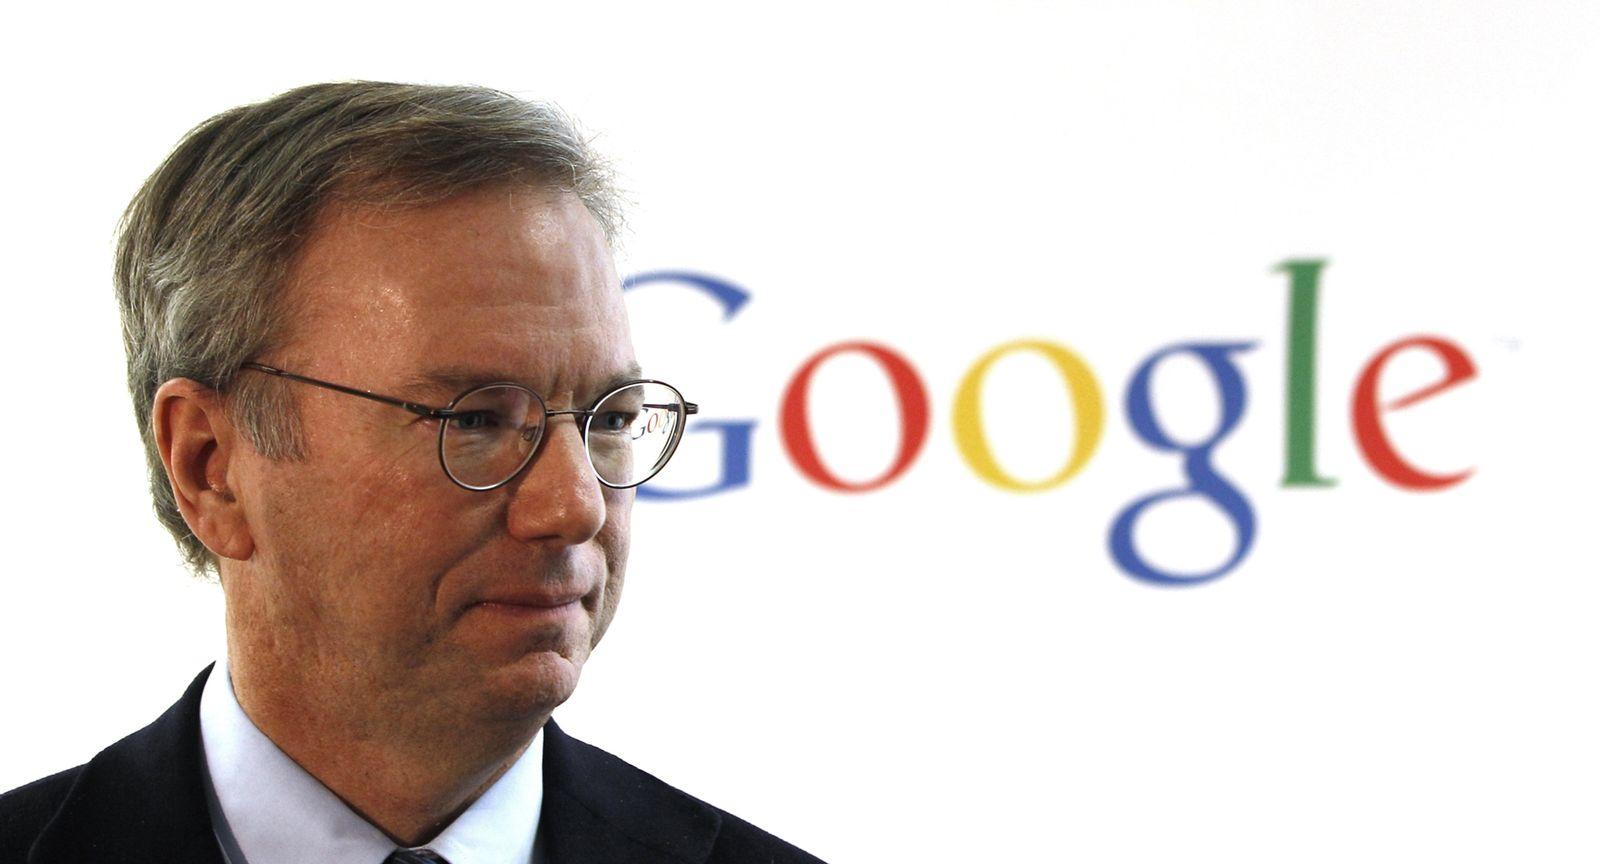 Google / Eric Schmidt